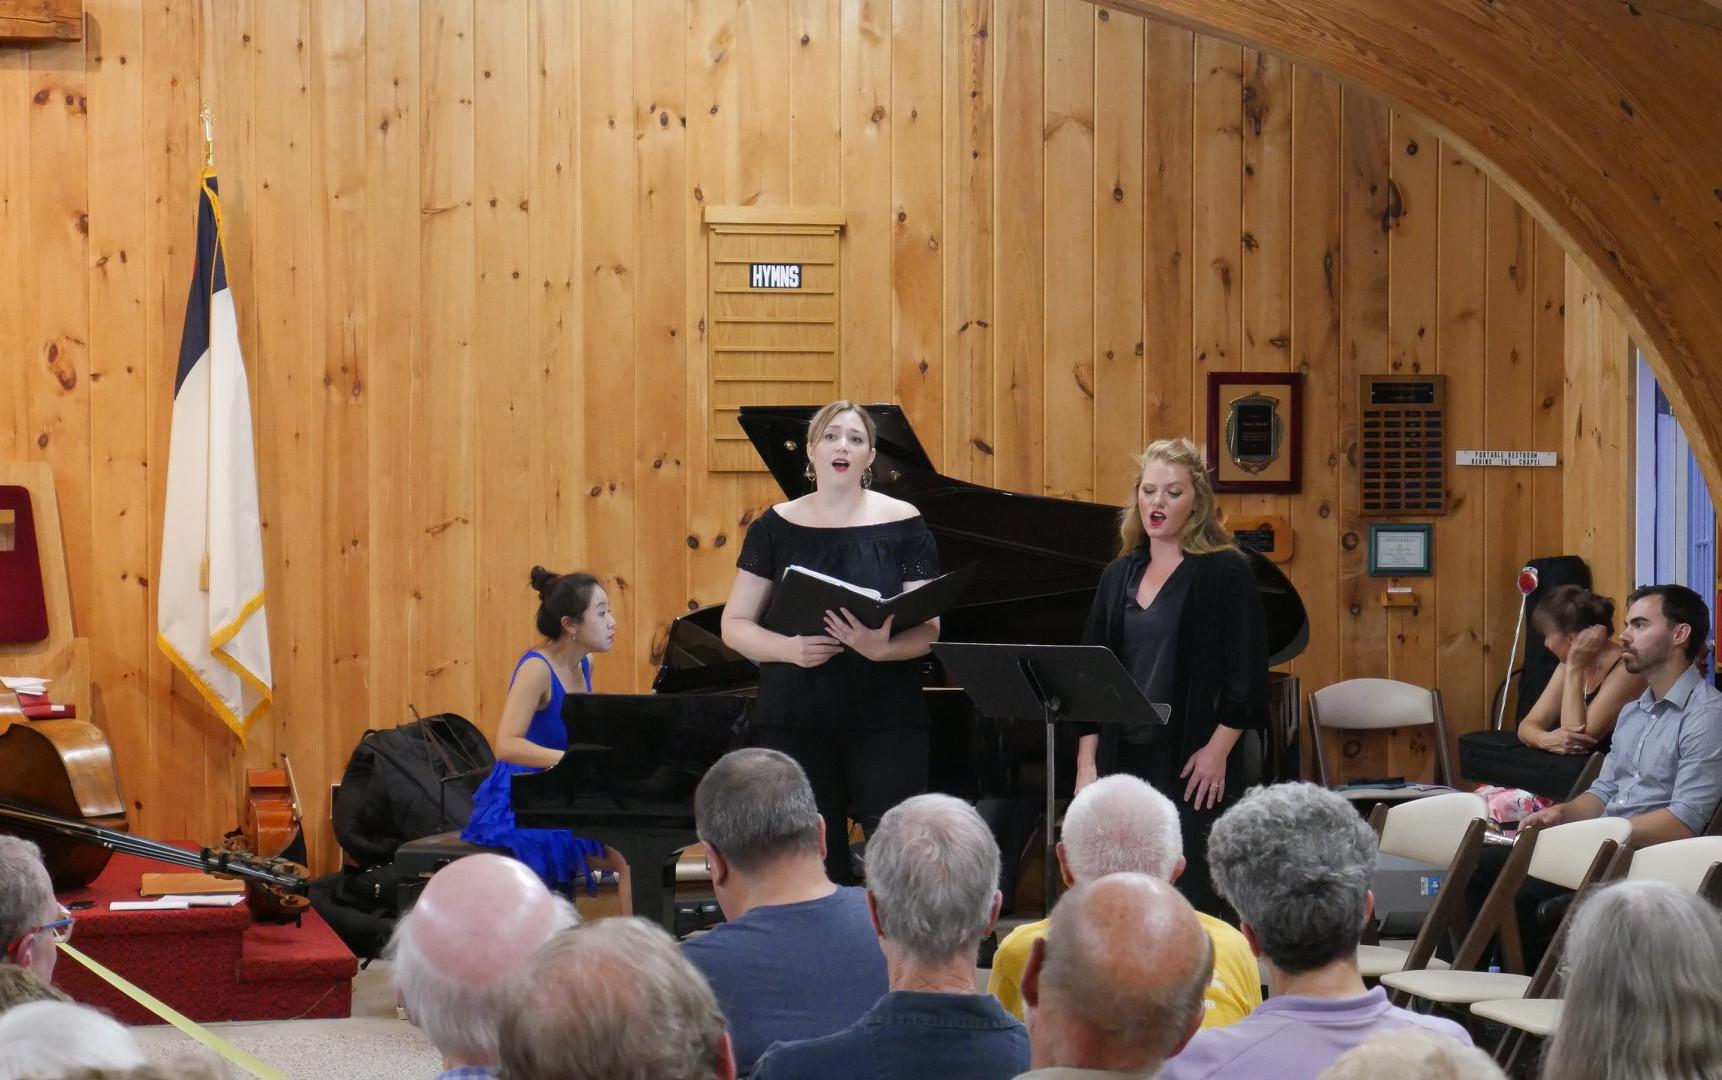 Caroga Lake Music Festival